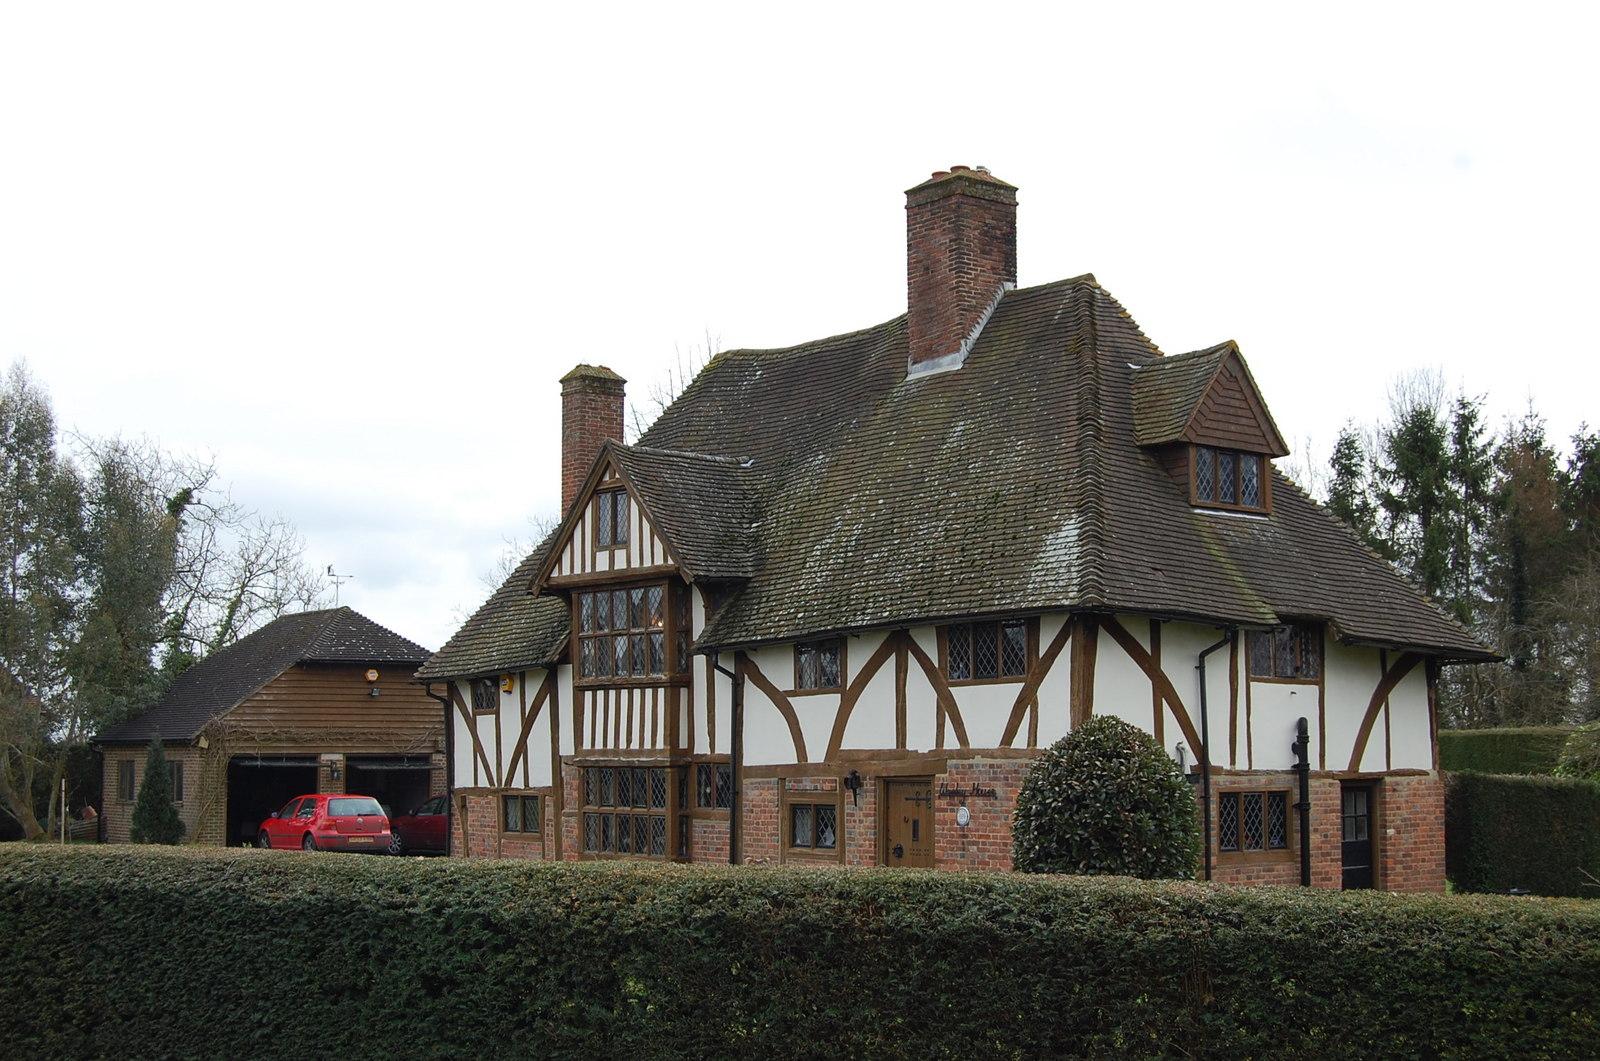 file half timbered house maytham road rolvenden wikimedia. Black Bedroom Furniture Sets. Home Design Ideas